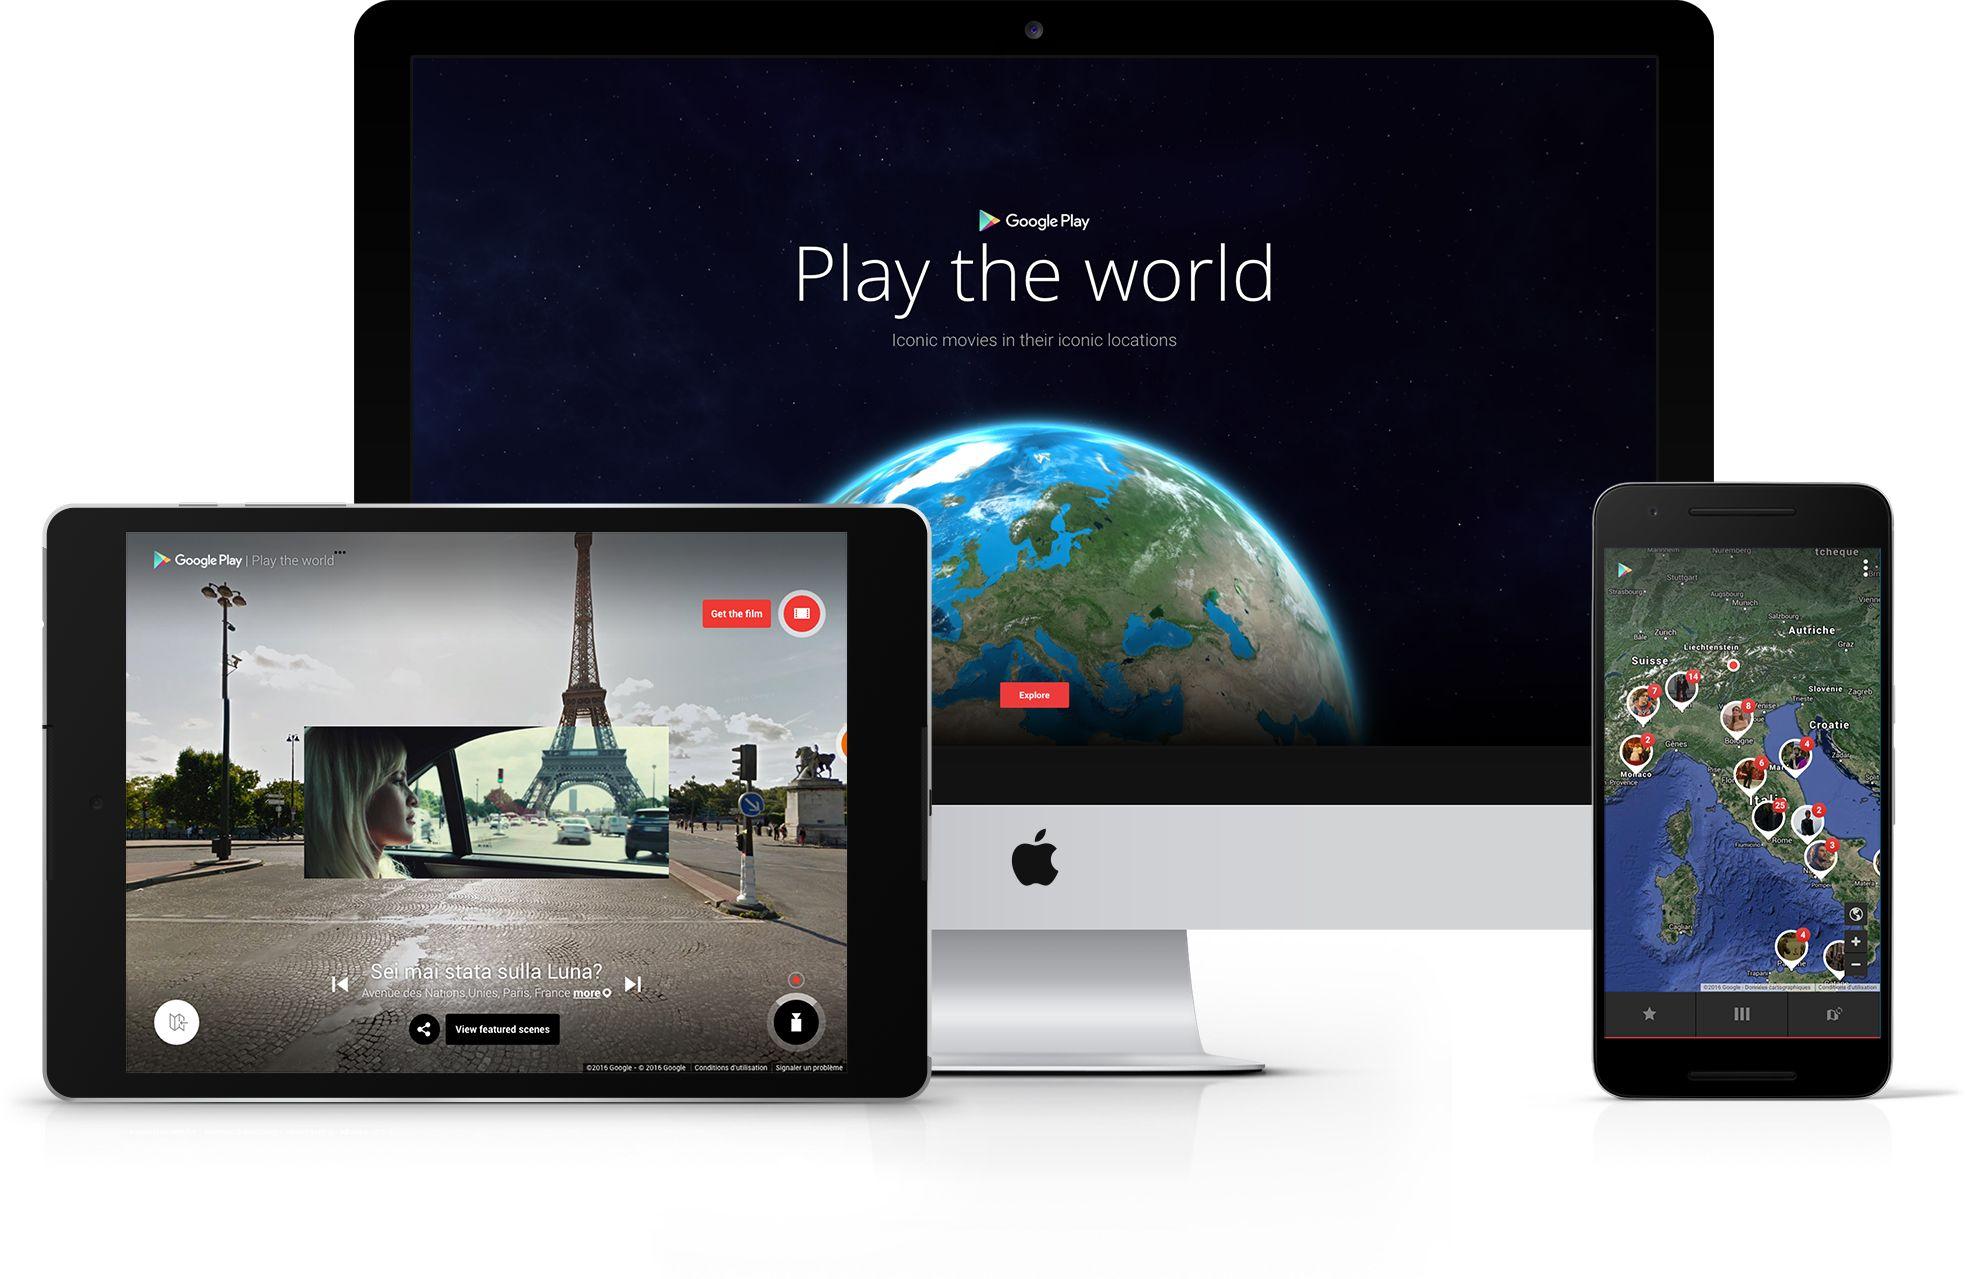 People's Voice / Webby Award Winner - GOOGLE PLAY: PLAY THE WORLD